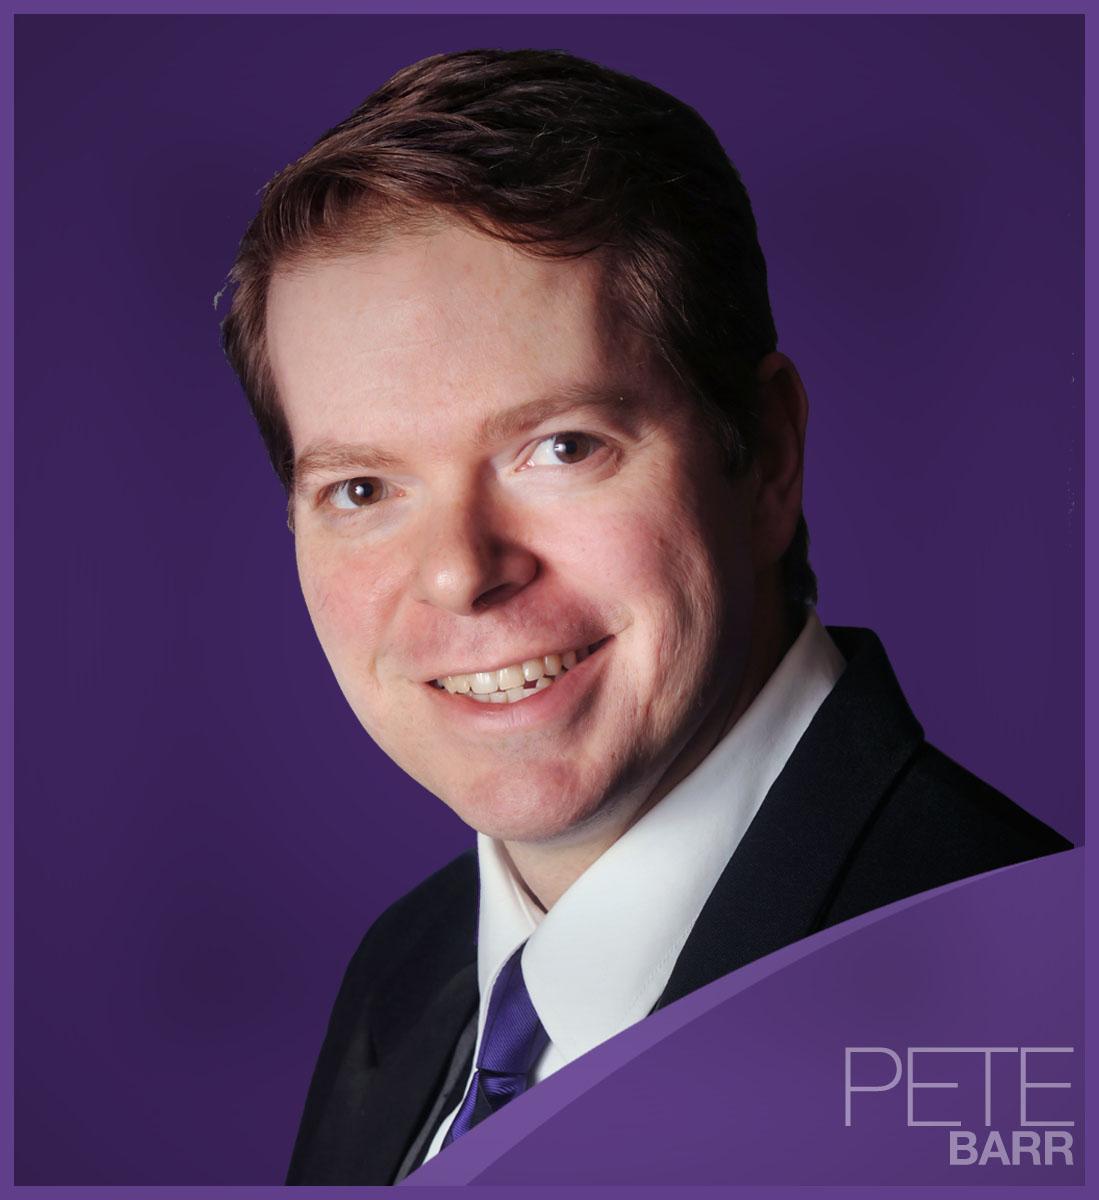 Pete Barr